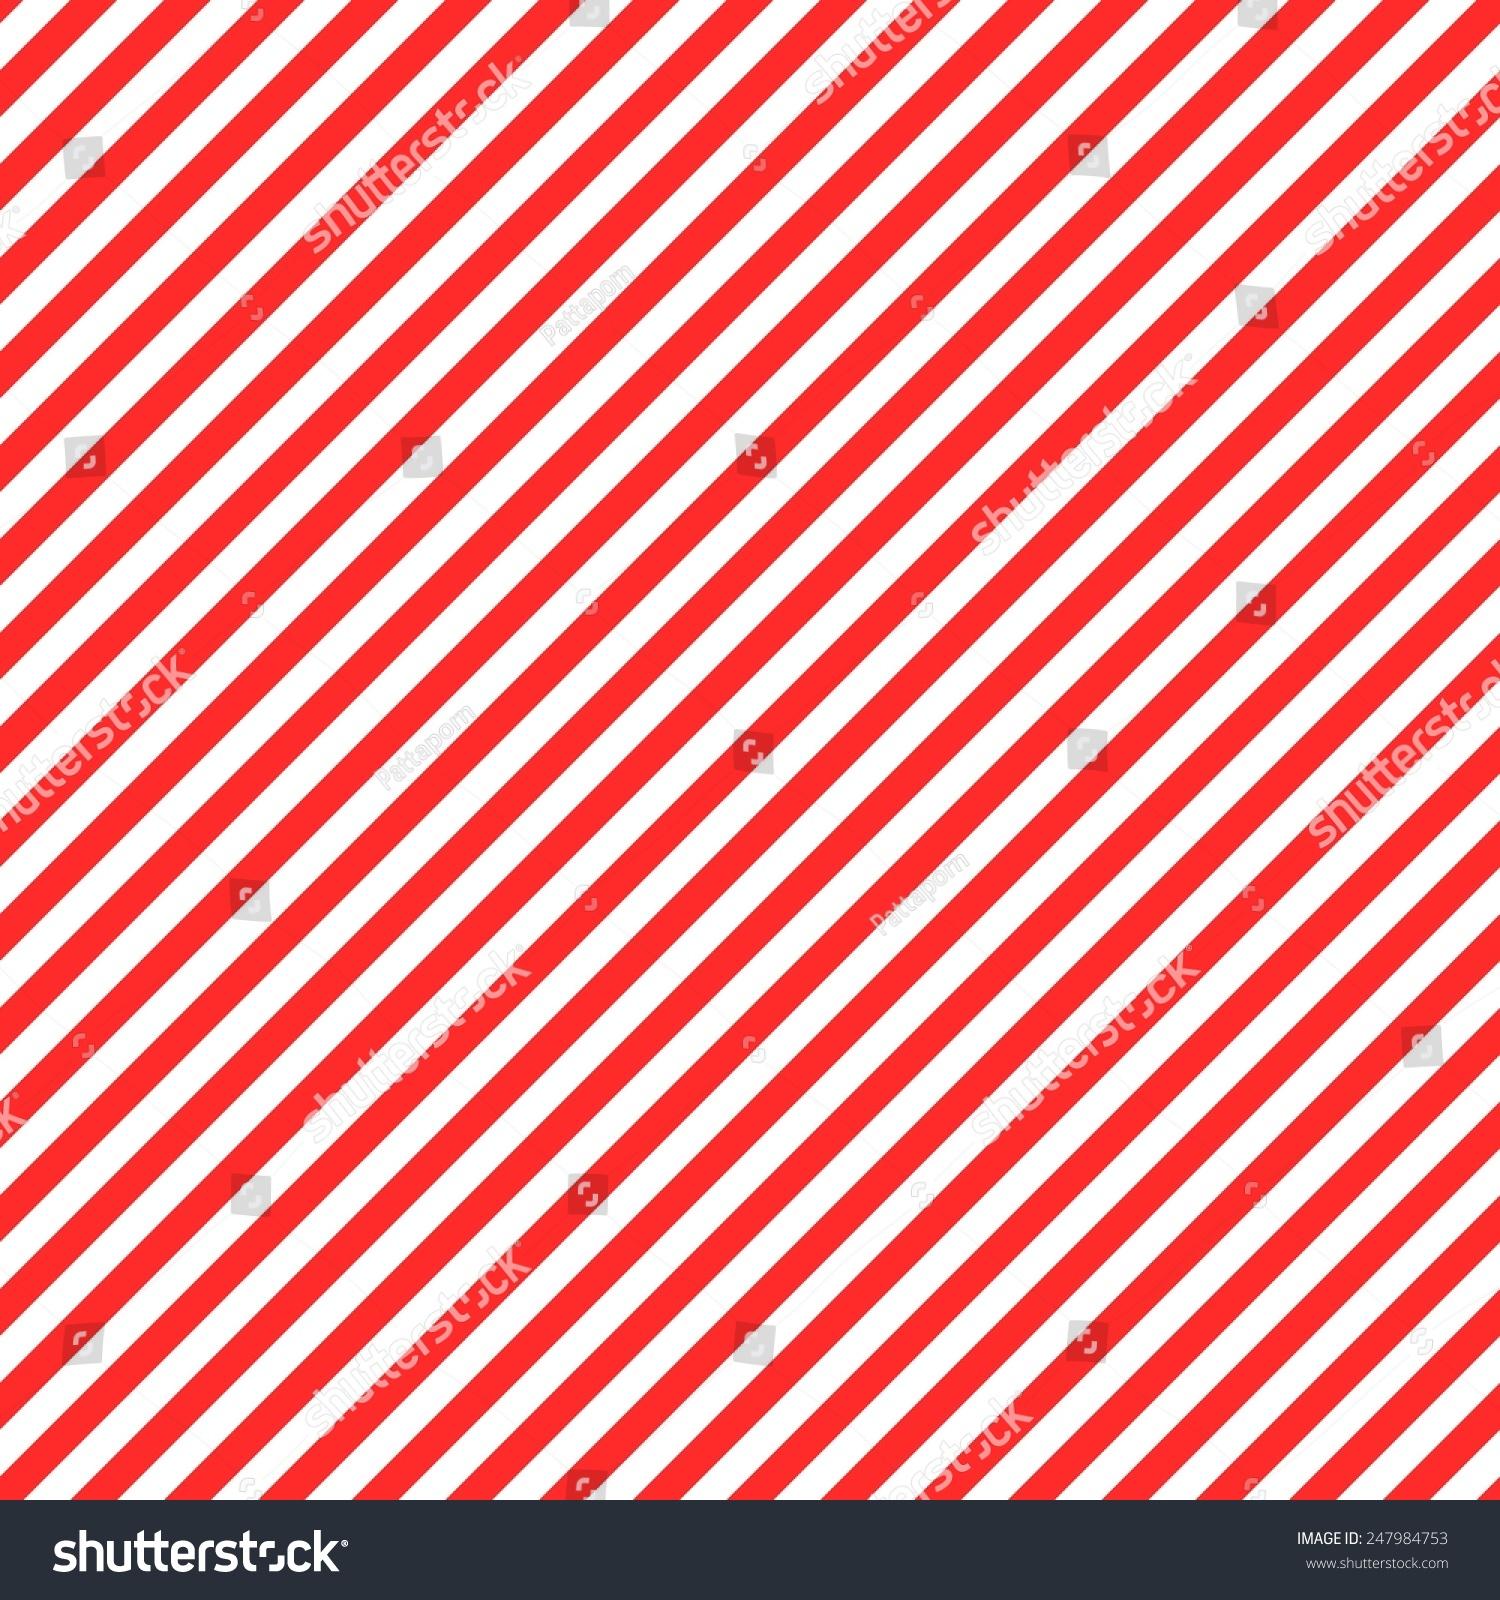 Digital Paper Scrapbook Red Stripes Pattern Stock